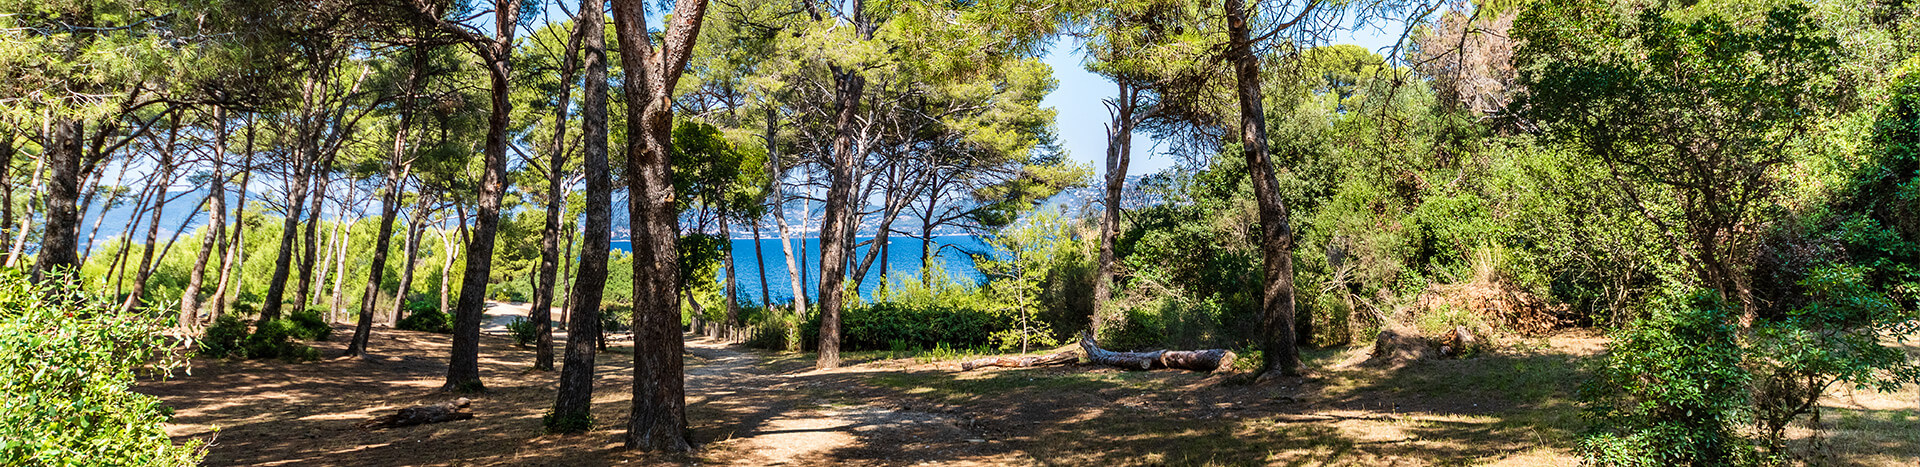 camping-olbia-tarifs-reservation-1920xauto_0_1